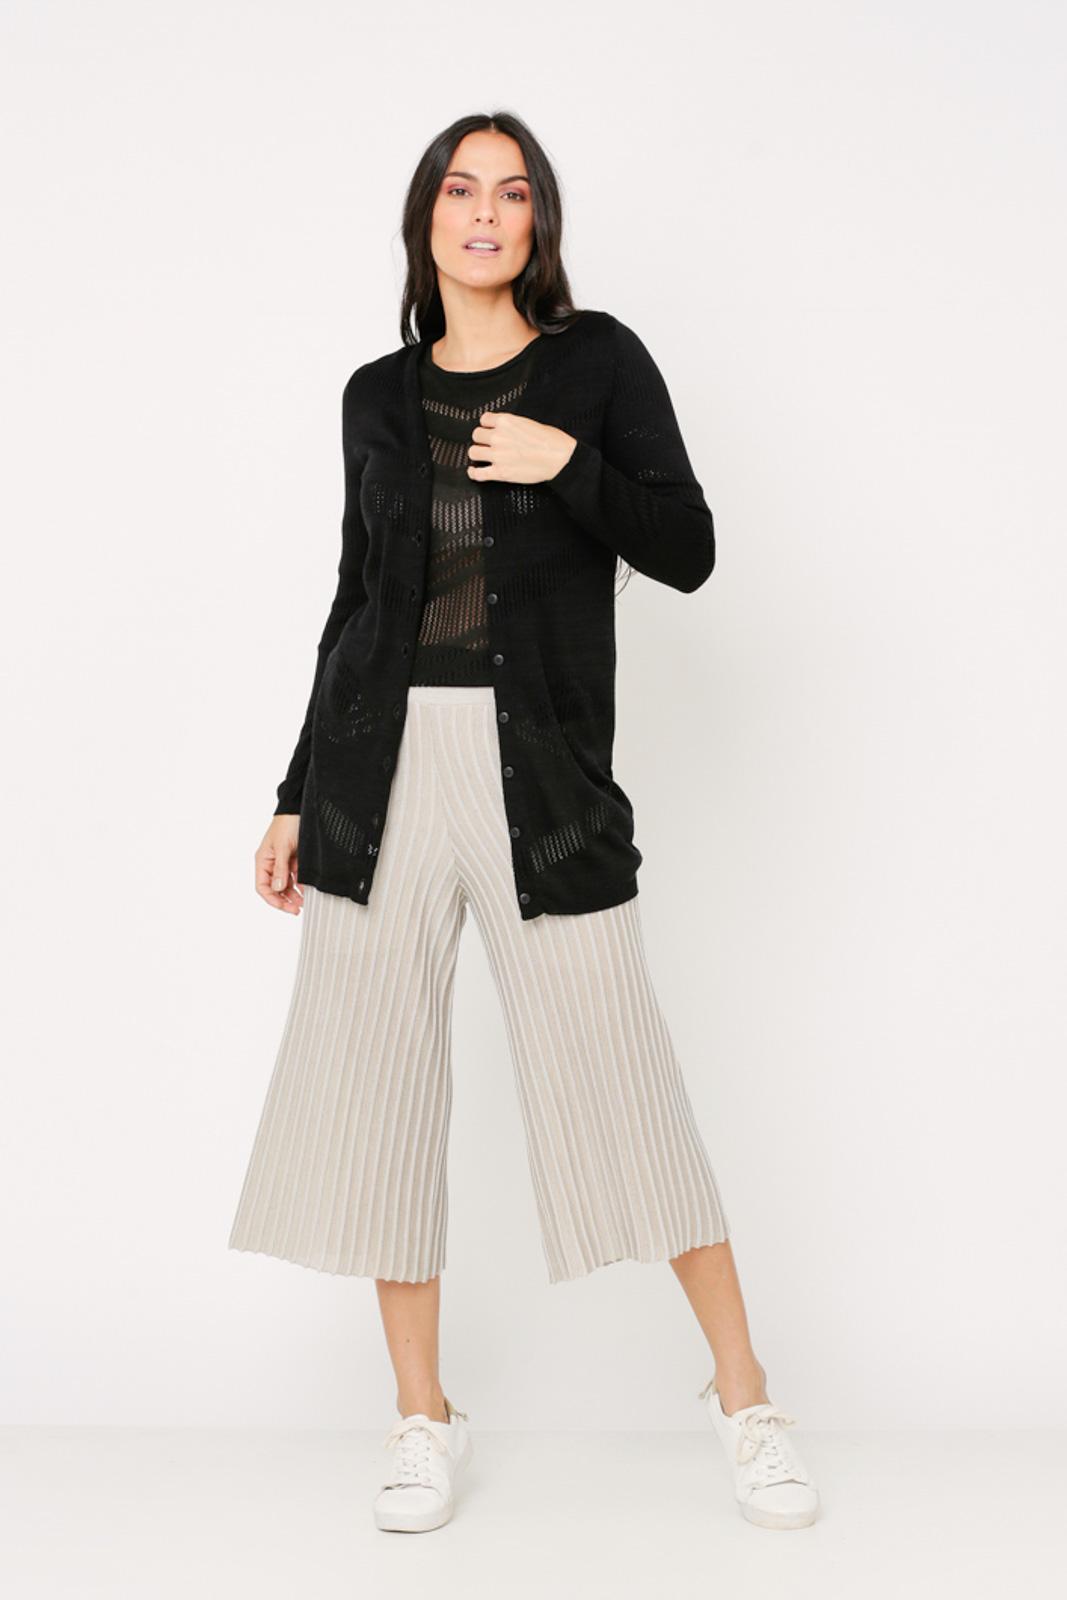 Conjunto de tricot Ralm twinset  pontilhado - Preto